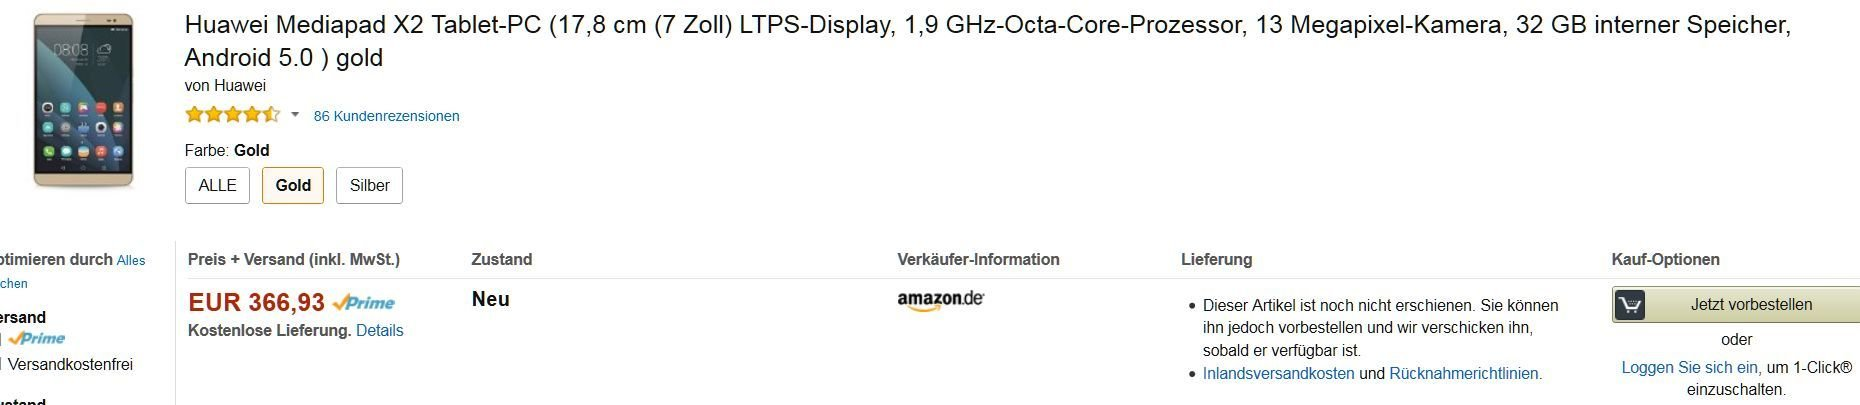 Mediapad X2 bei Amazon noch immer